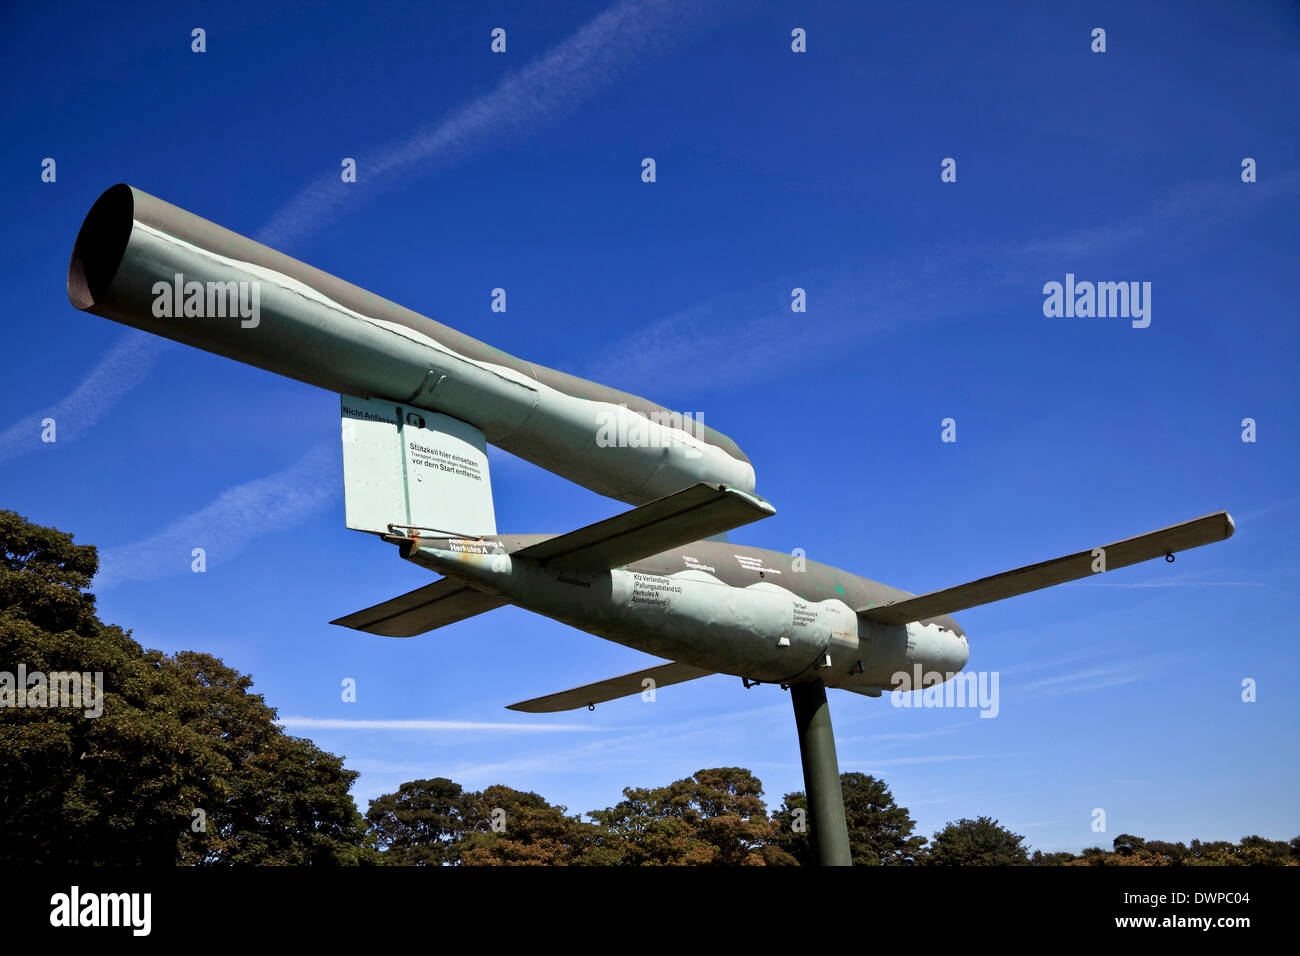 9385. WW2 German V 1 Rocket Bomb, Manston Museum, Manston Kent, England - Stock Image